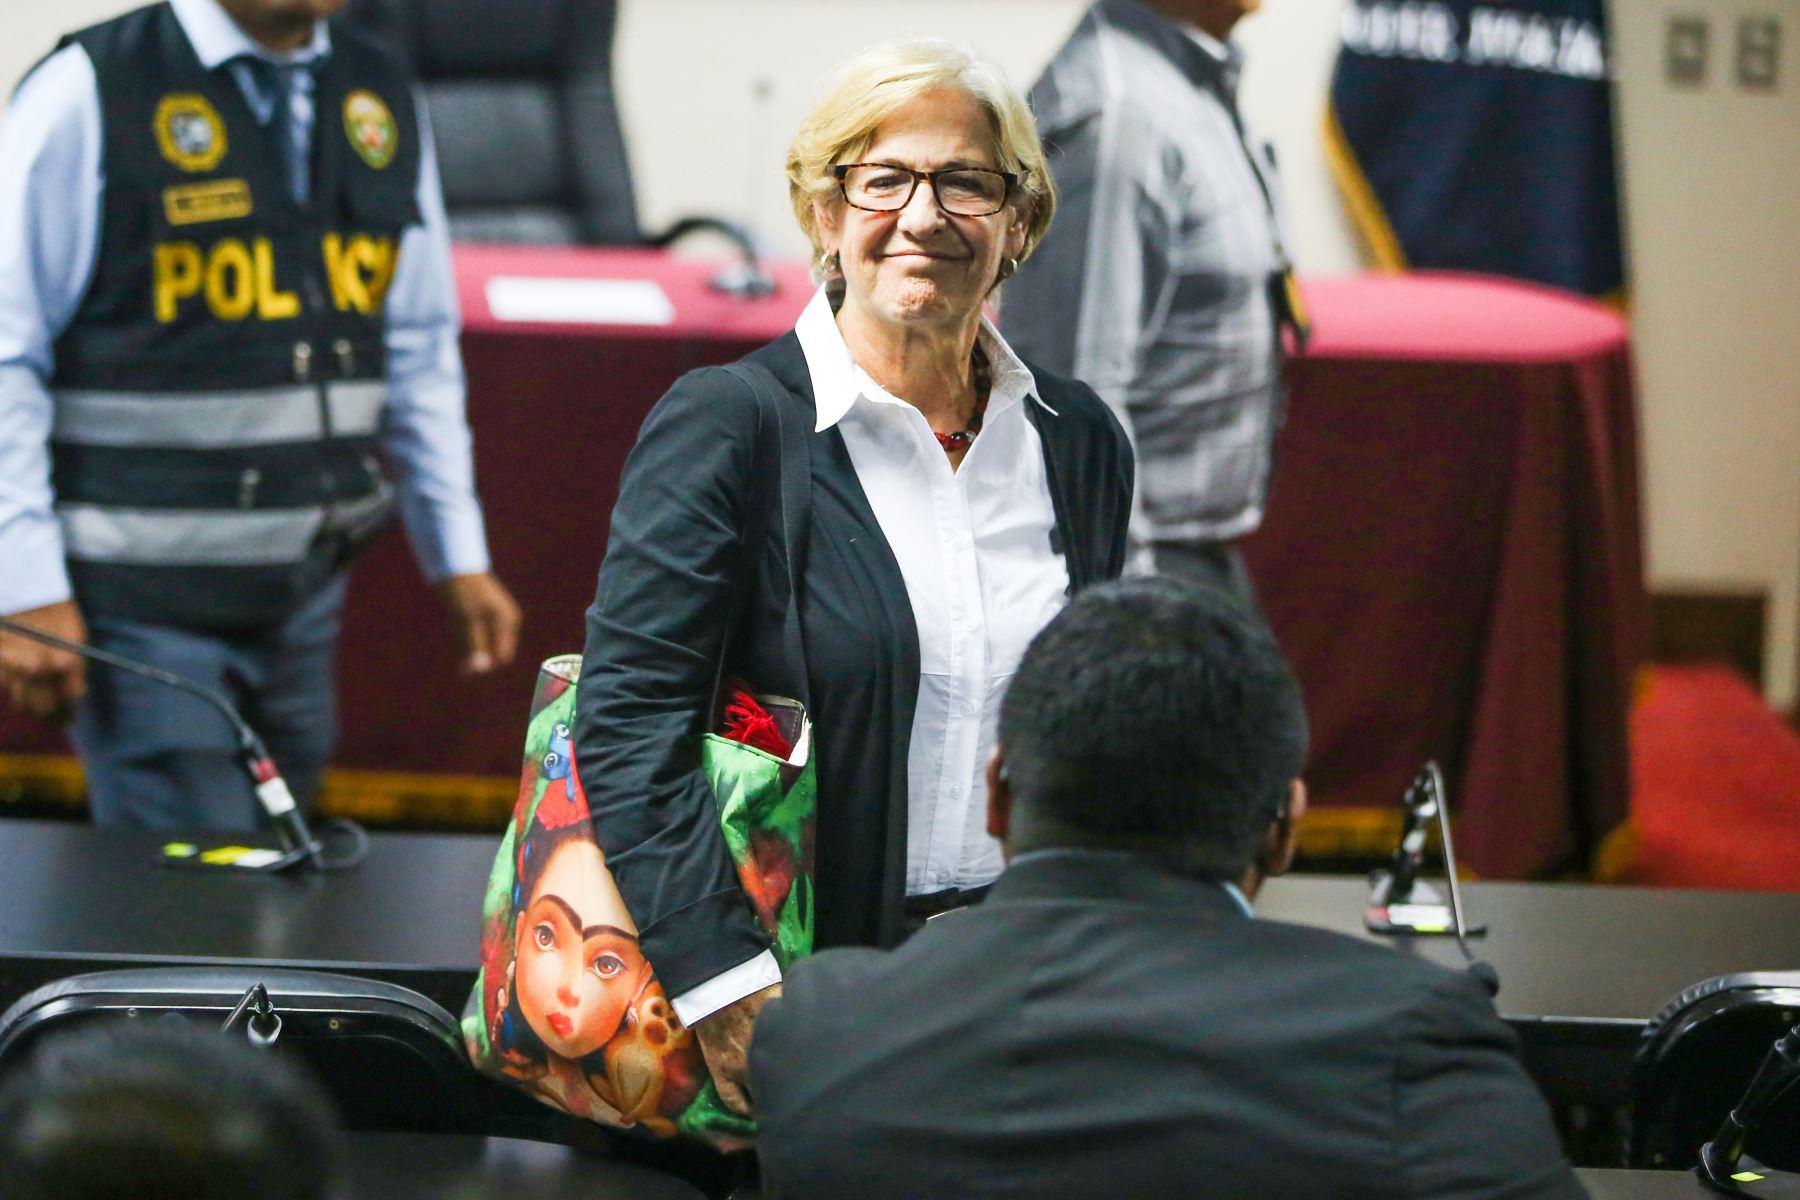 Jorge Barata revela que Susana Villarán tenía el 'codinome' de 'Careca' (Agencia Andina)